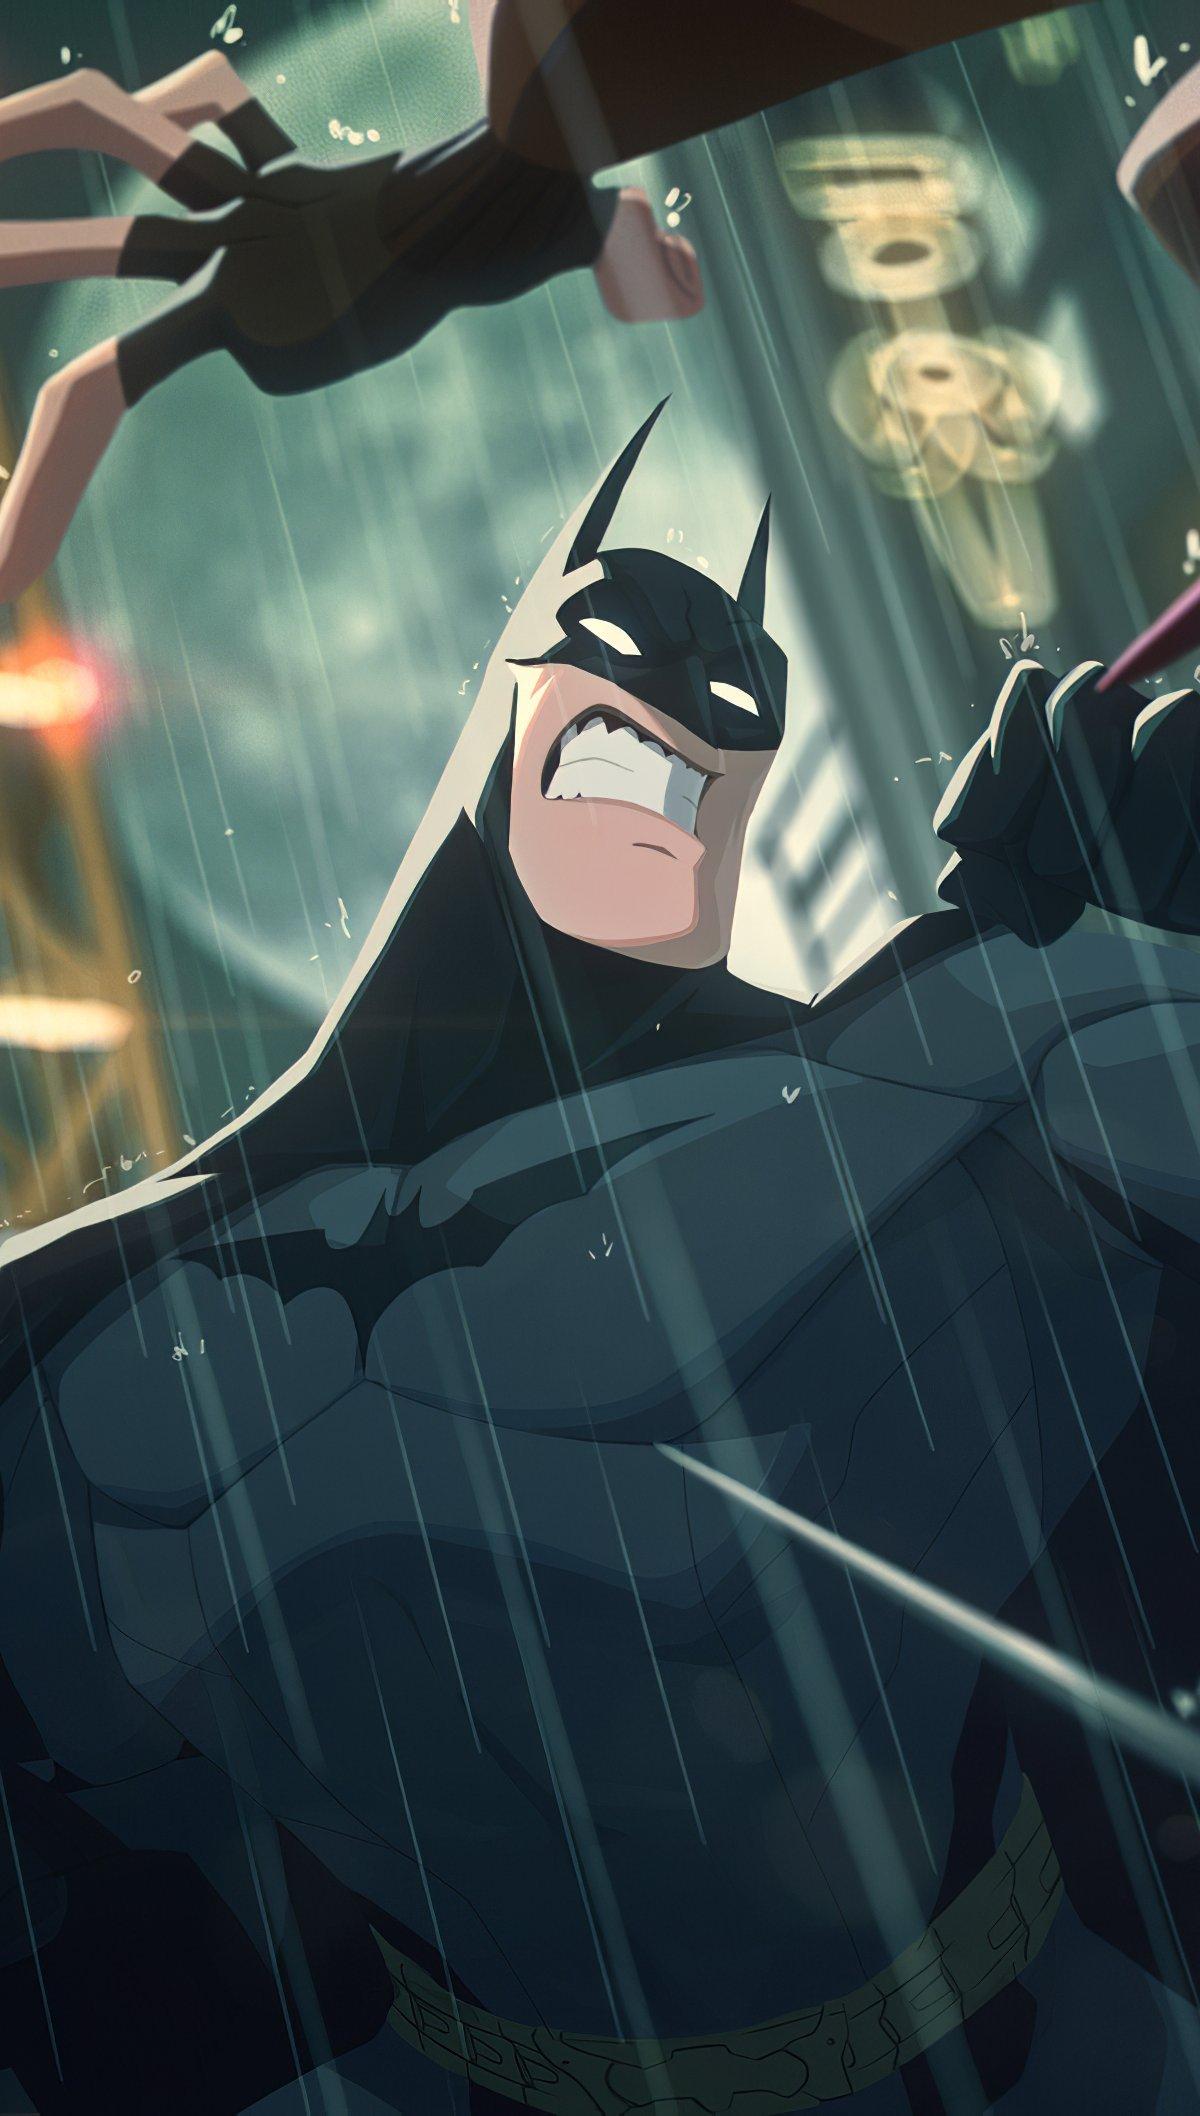 Wallpaper Batman Fighting Caricature Vertical